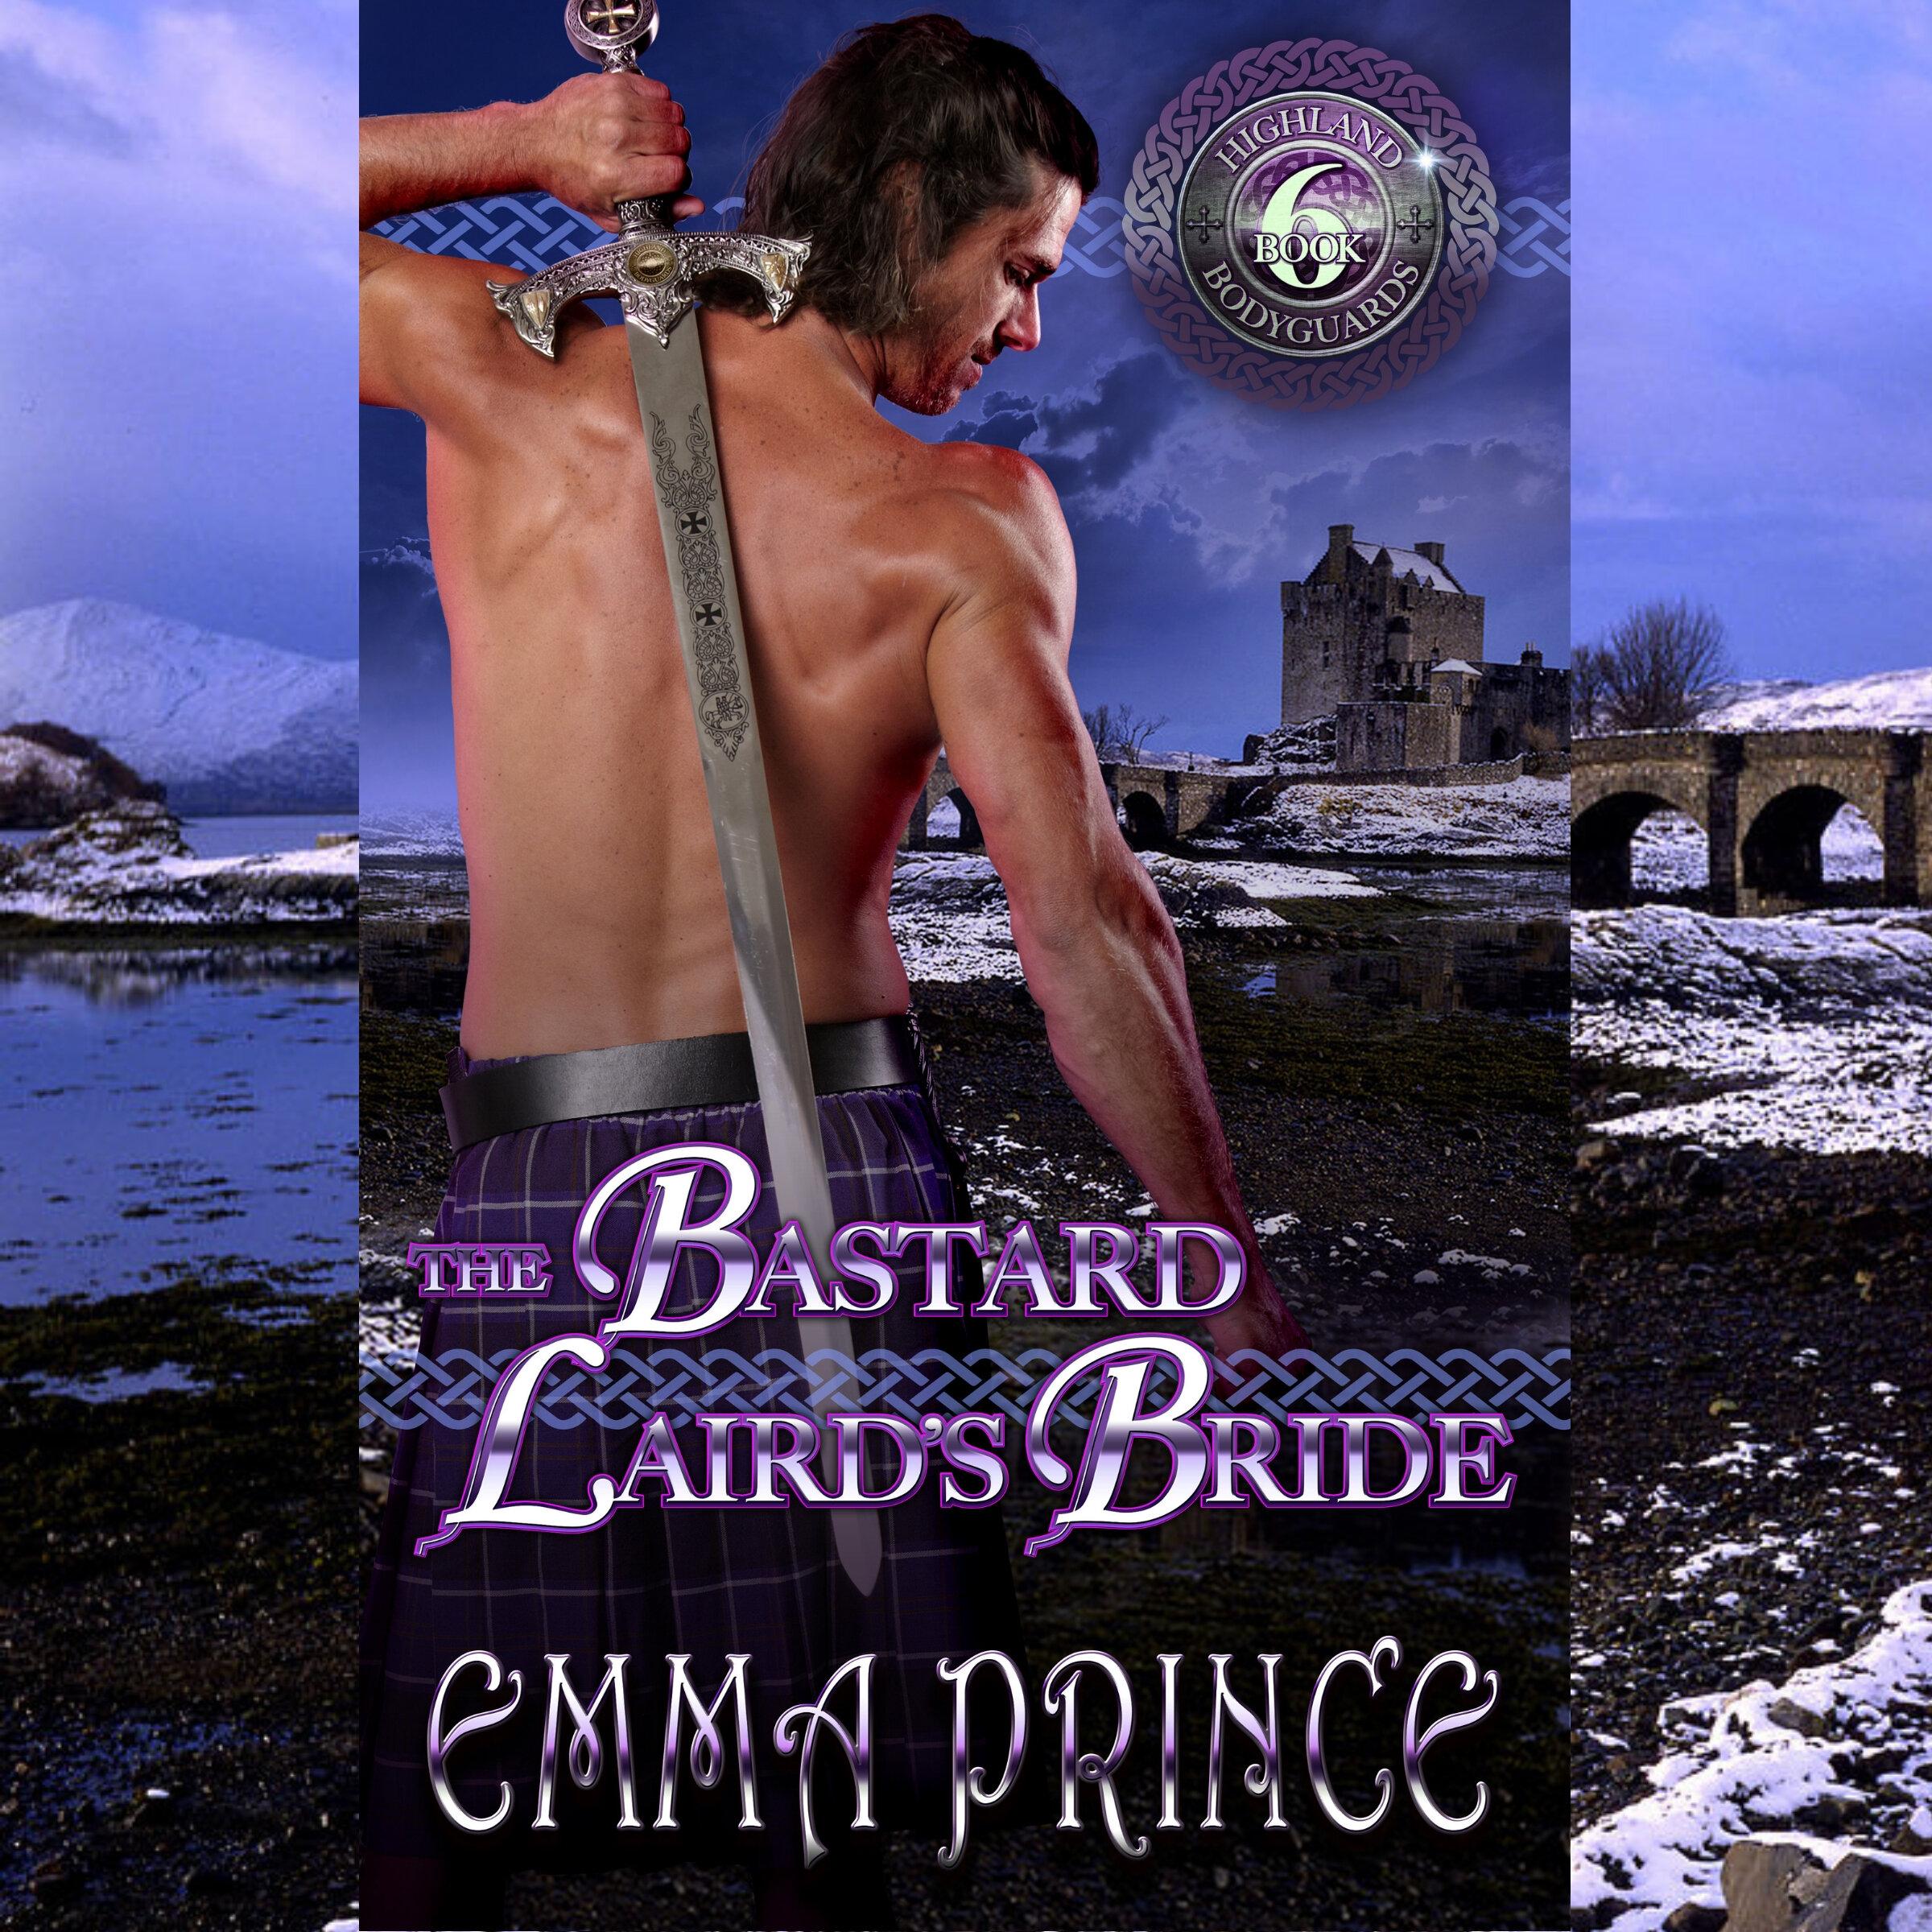 The Bastard Laird's Bride AUDIO cover.jpg